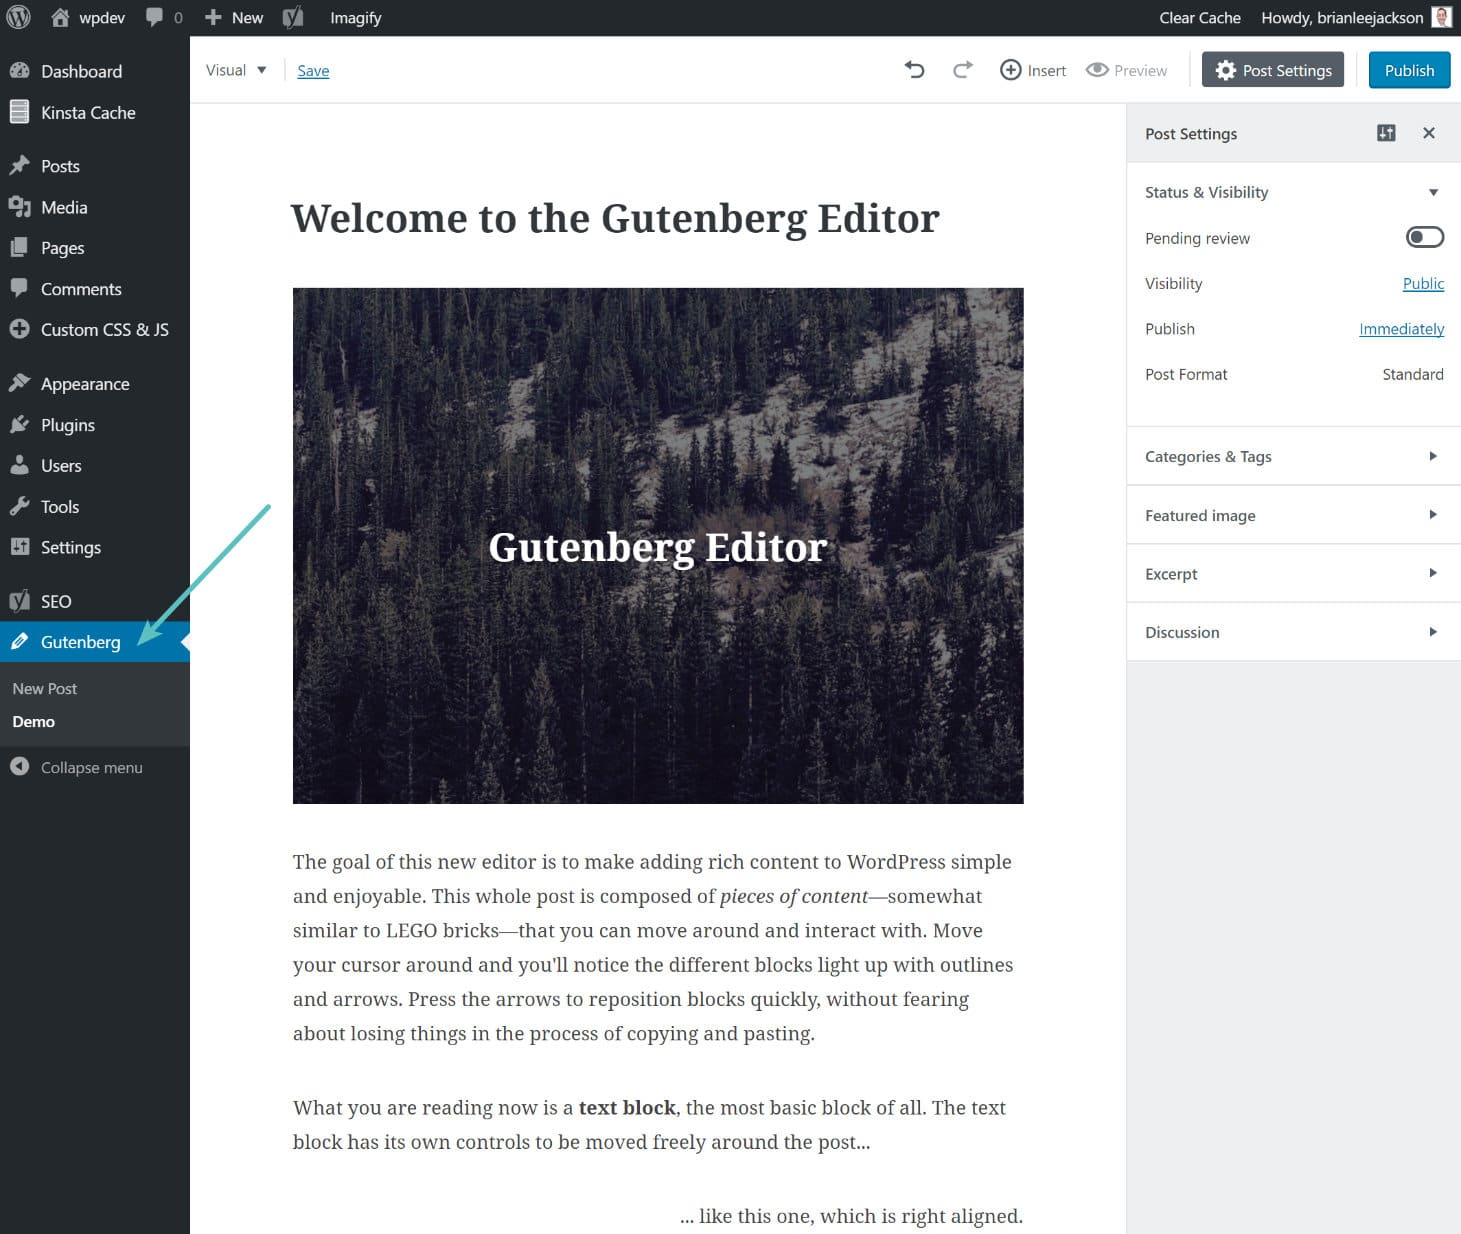 Gutenberg redigerare demo